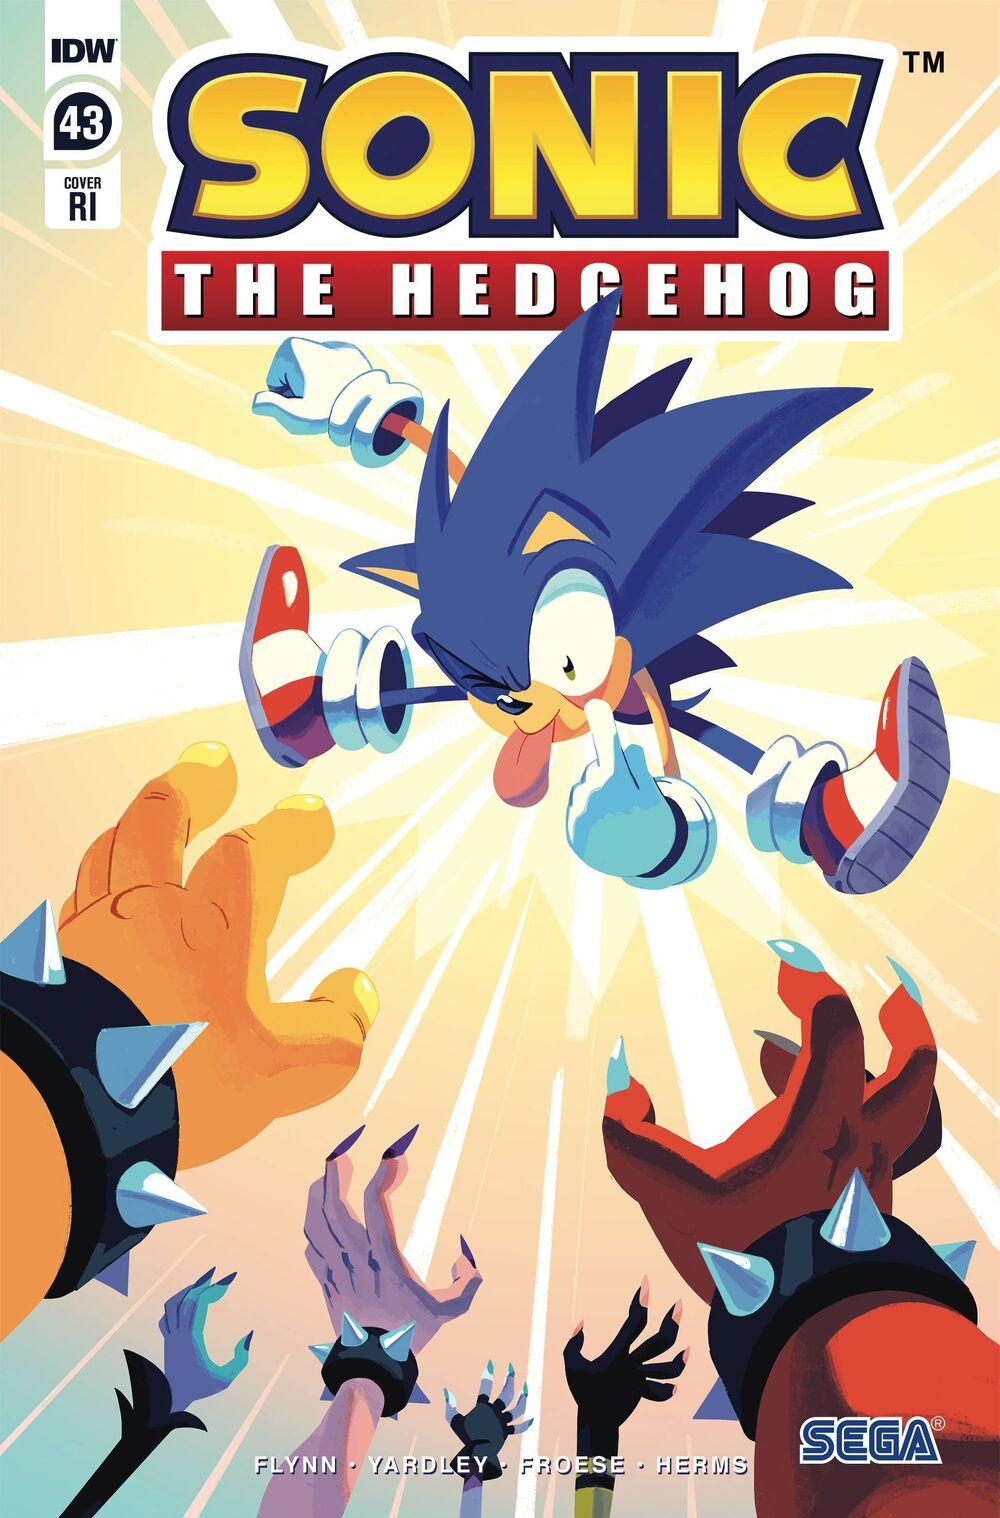 Sonic The Hedgehog #43 RI